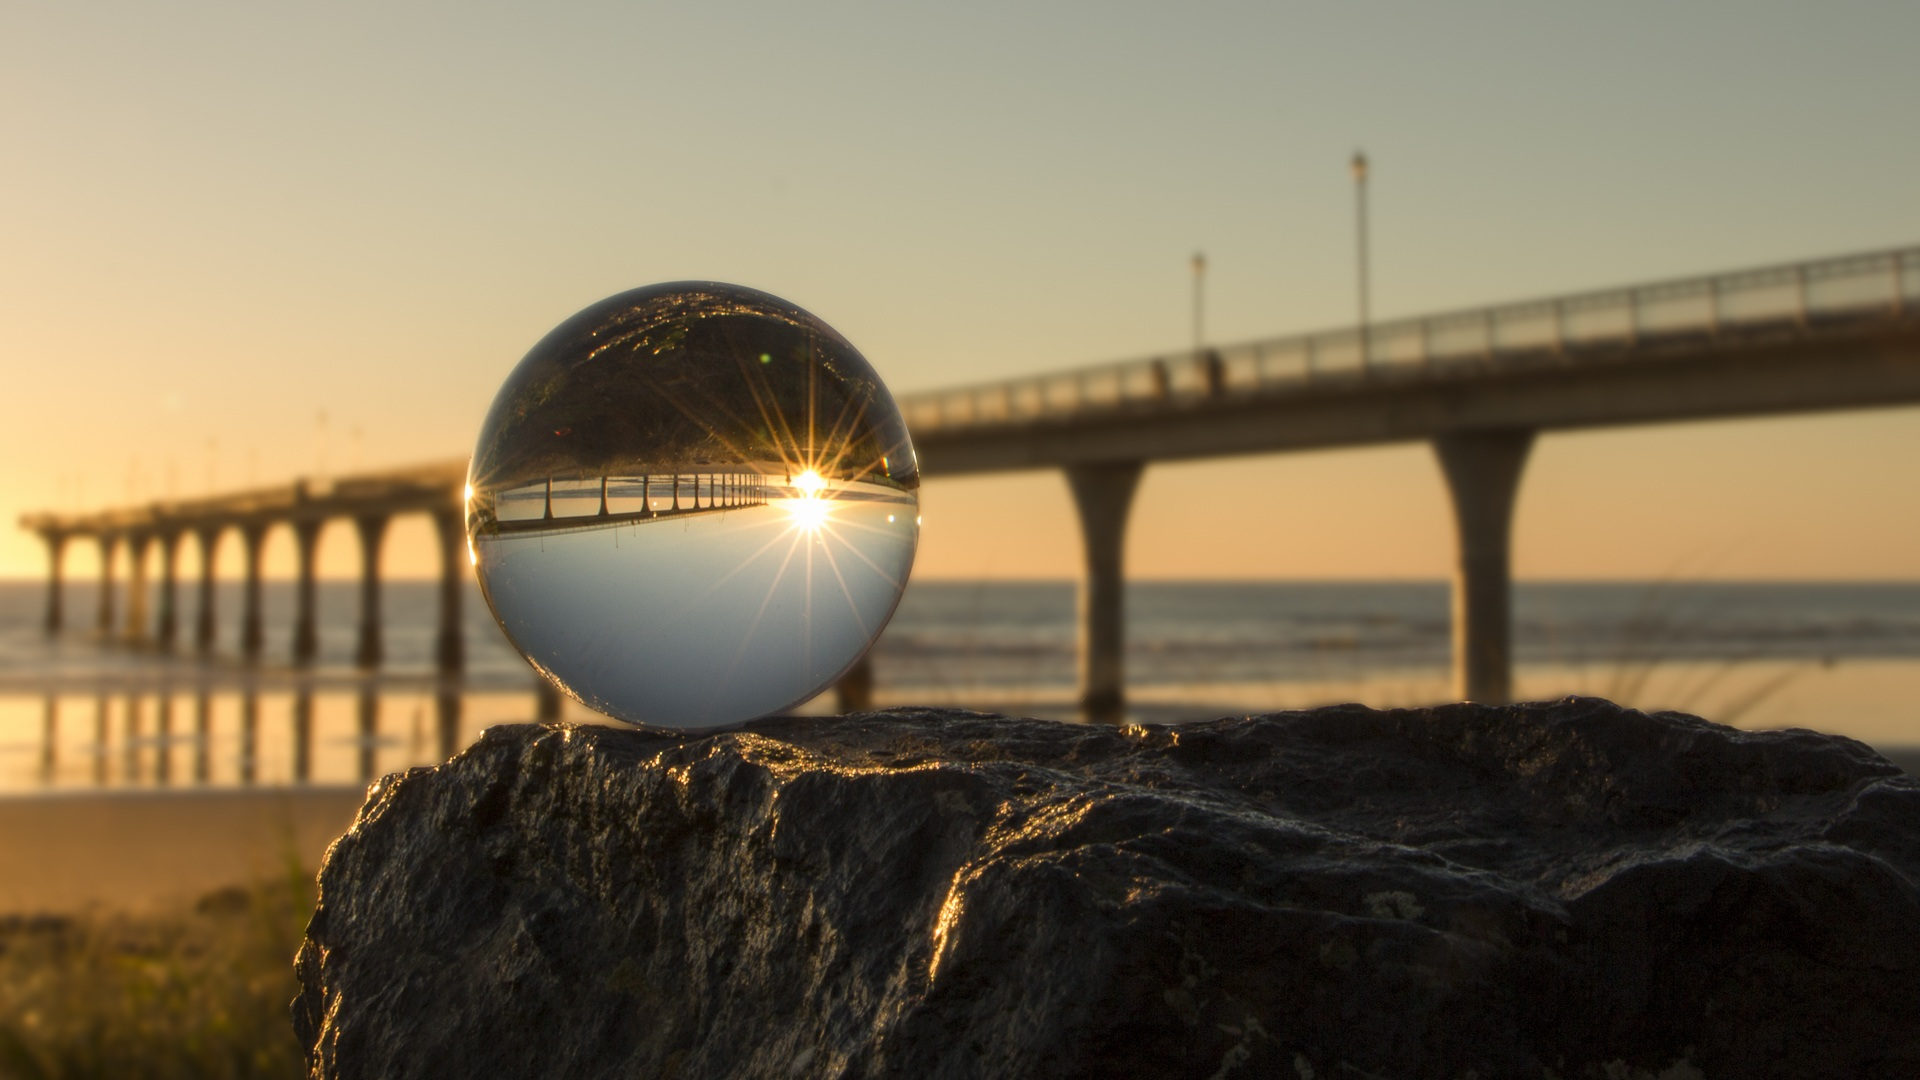 New brighton, Crystal ball, Brücke, Meer, Helligkeit, Himmel, Steinen - Wallpaper HD - Prof.-falken.com